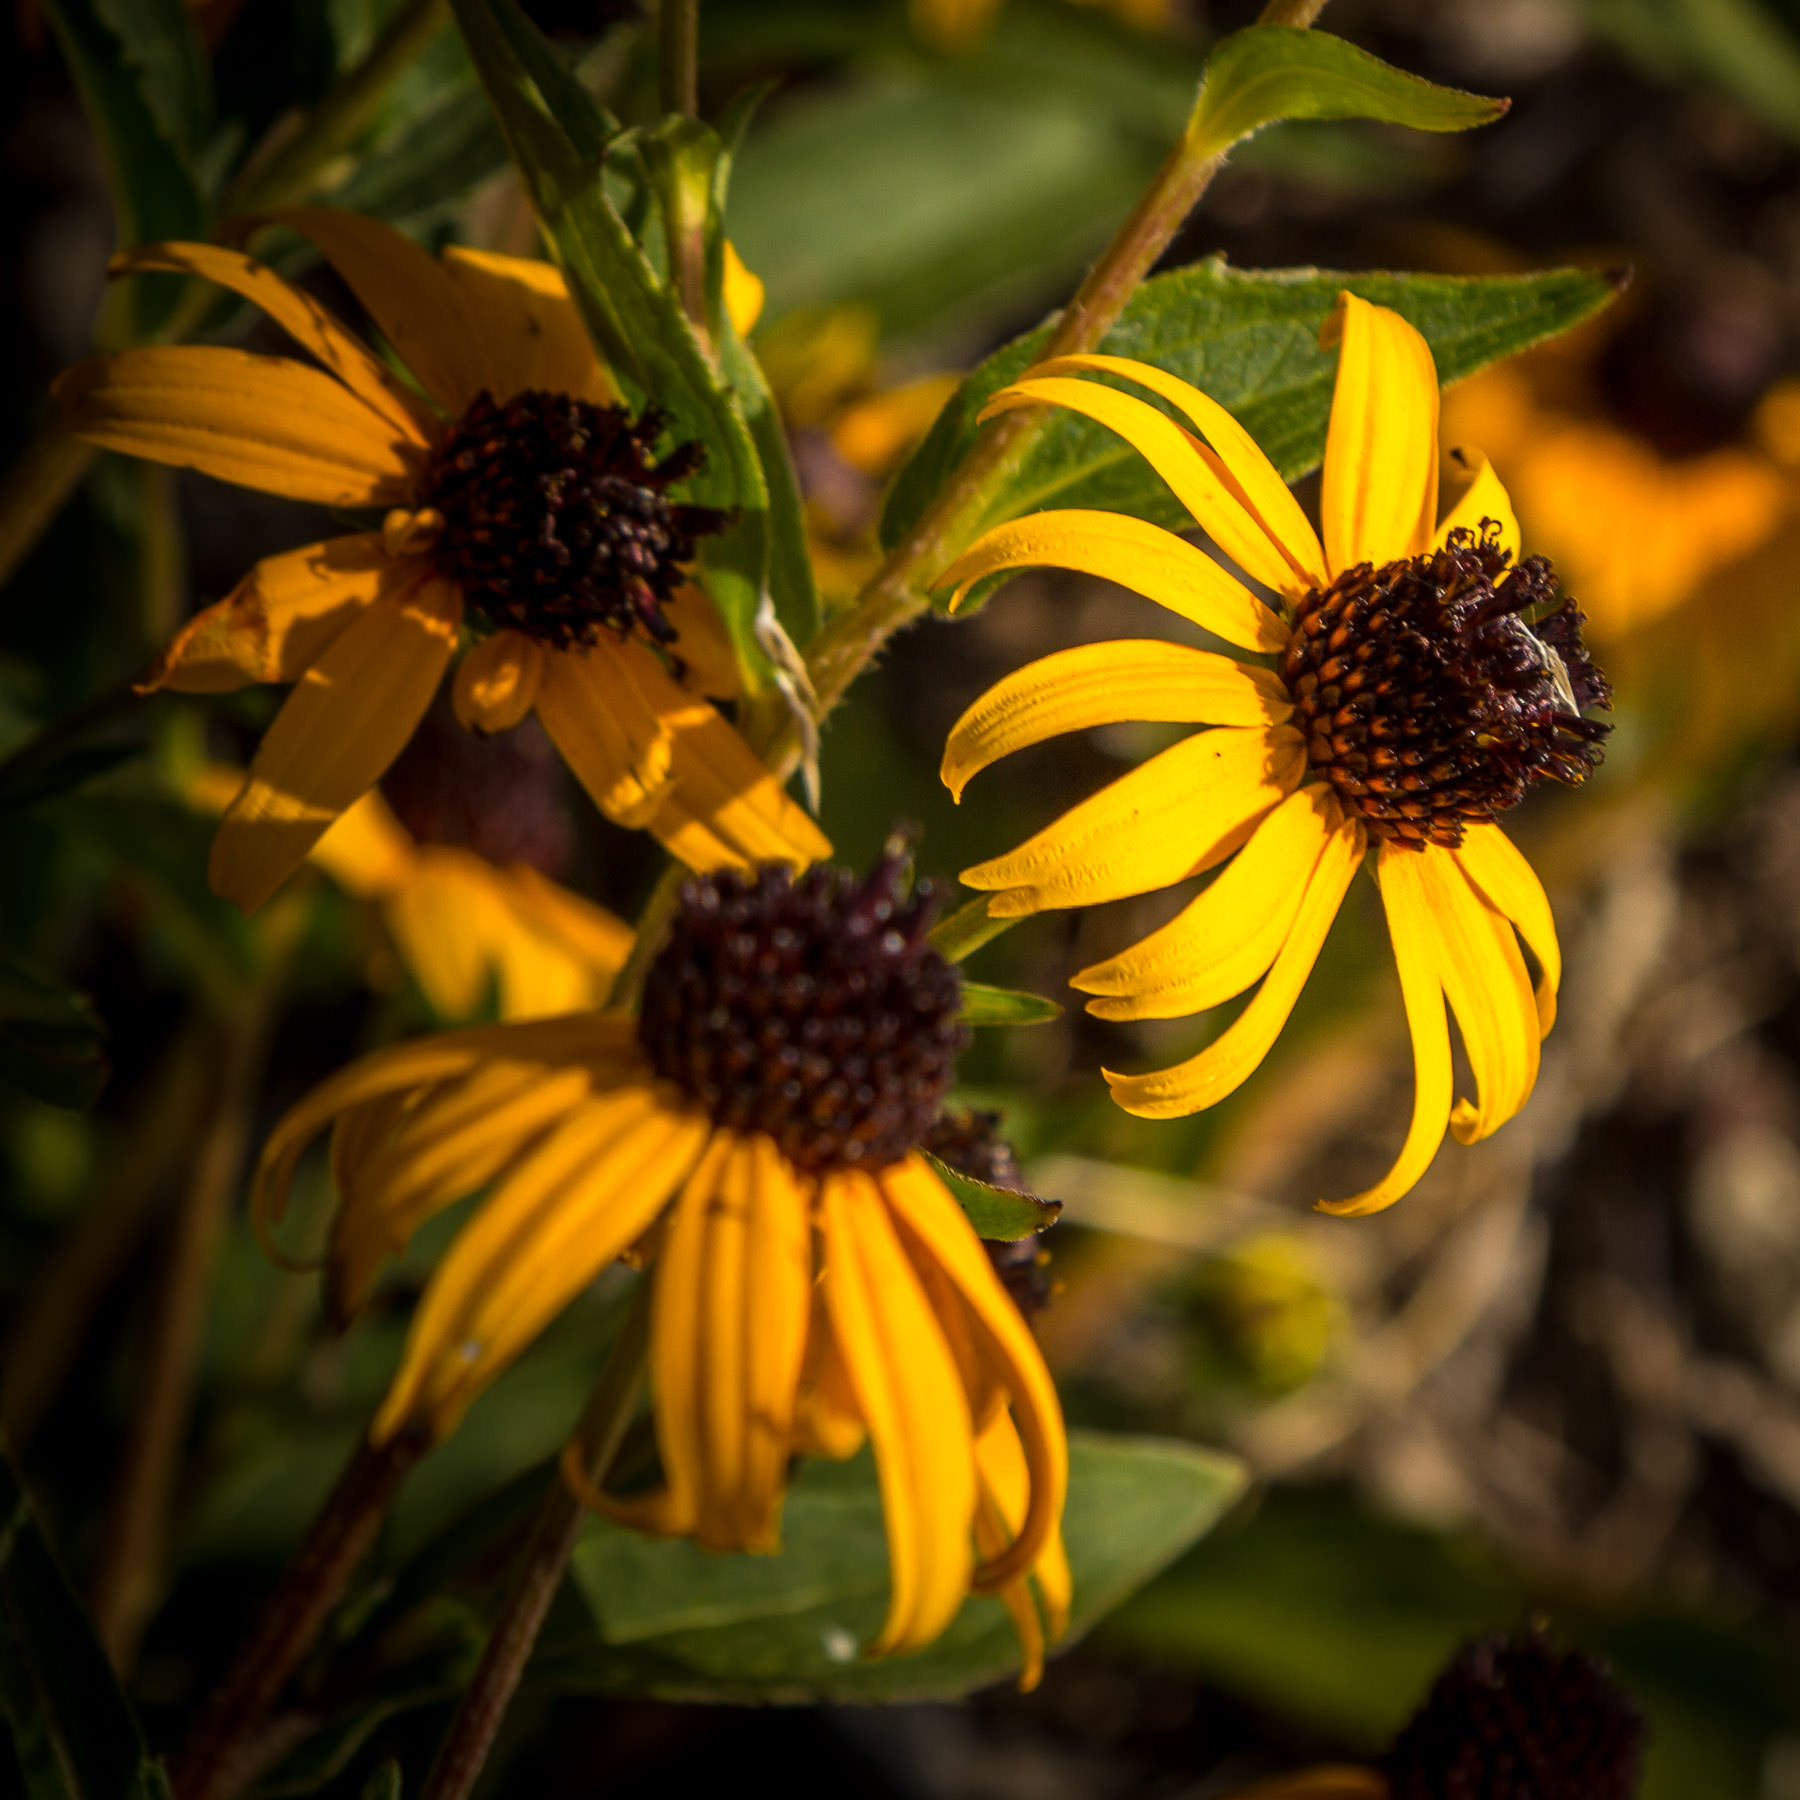 Three yellow daisies, also known as black-eyed susans, found at Dallas' Klyde Warren Park.